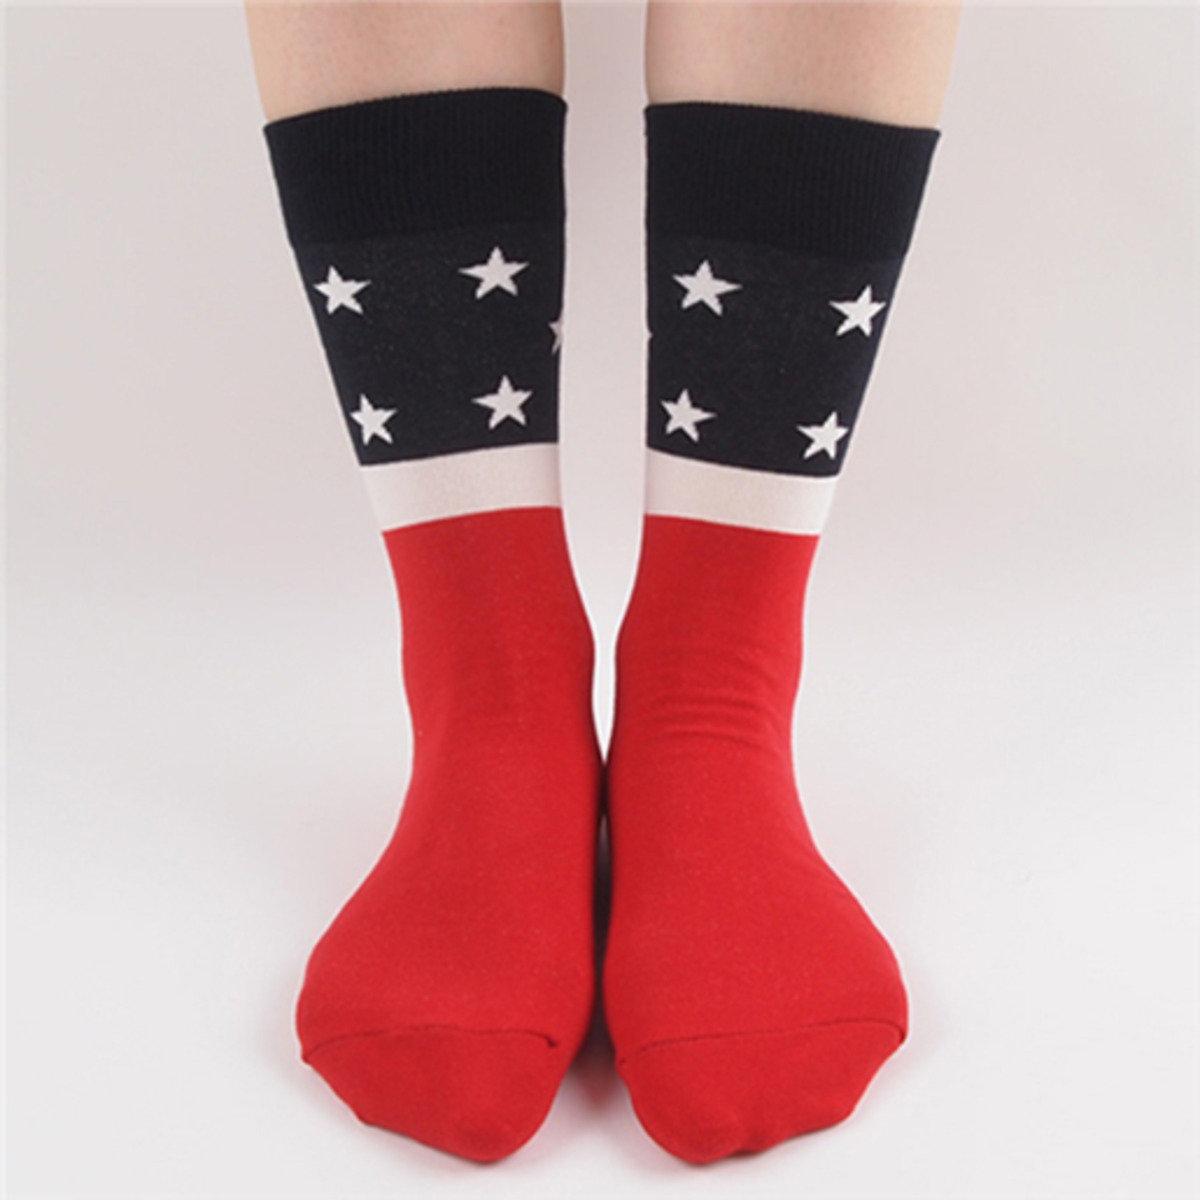 Stars 中筒襪_socks_13026